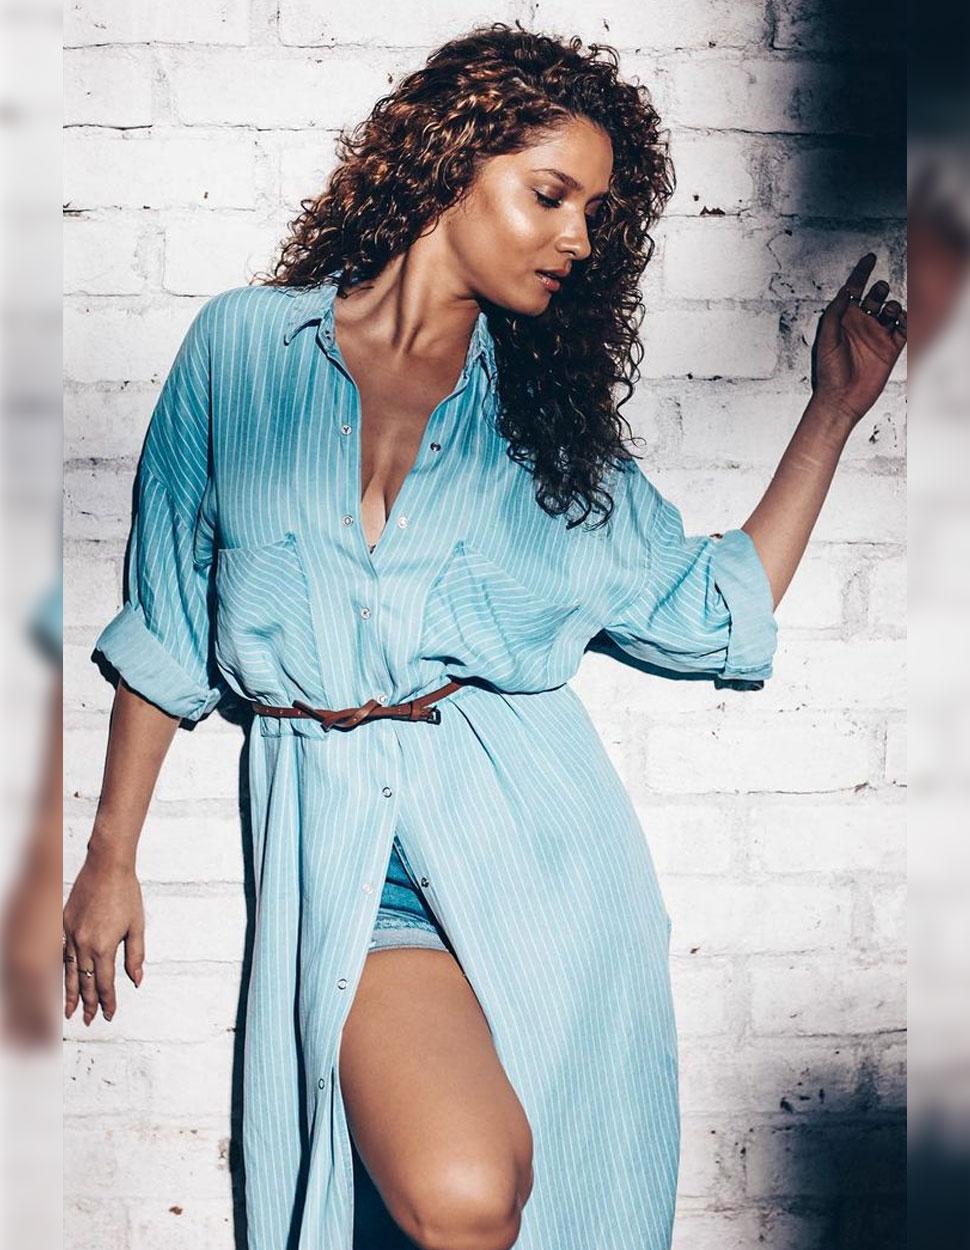 Ankita Lokhande in blue dress photos